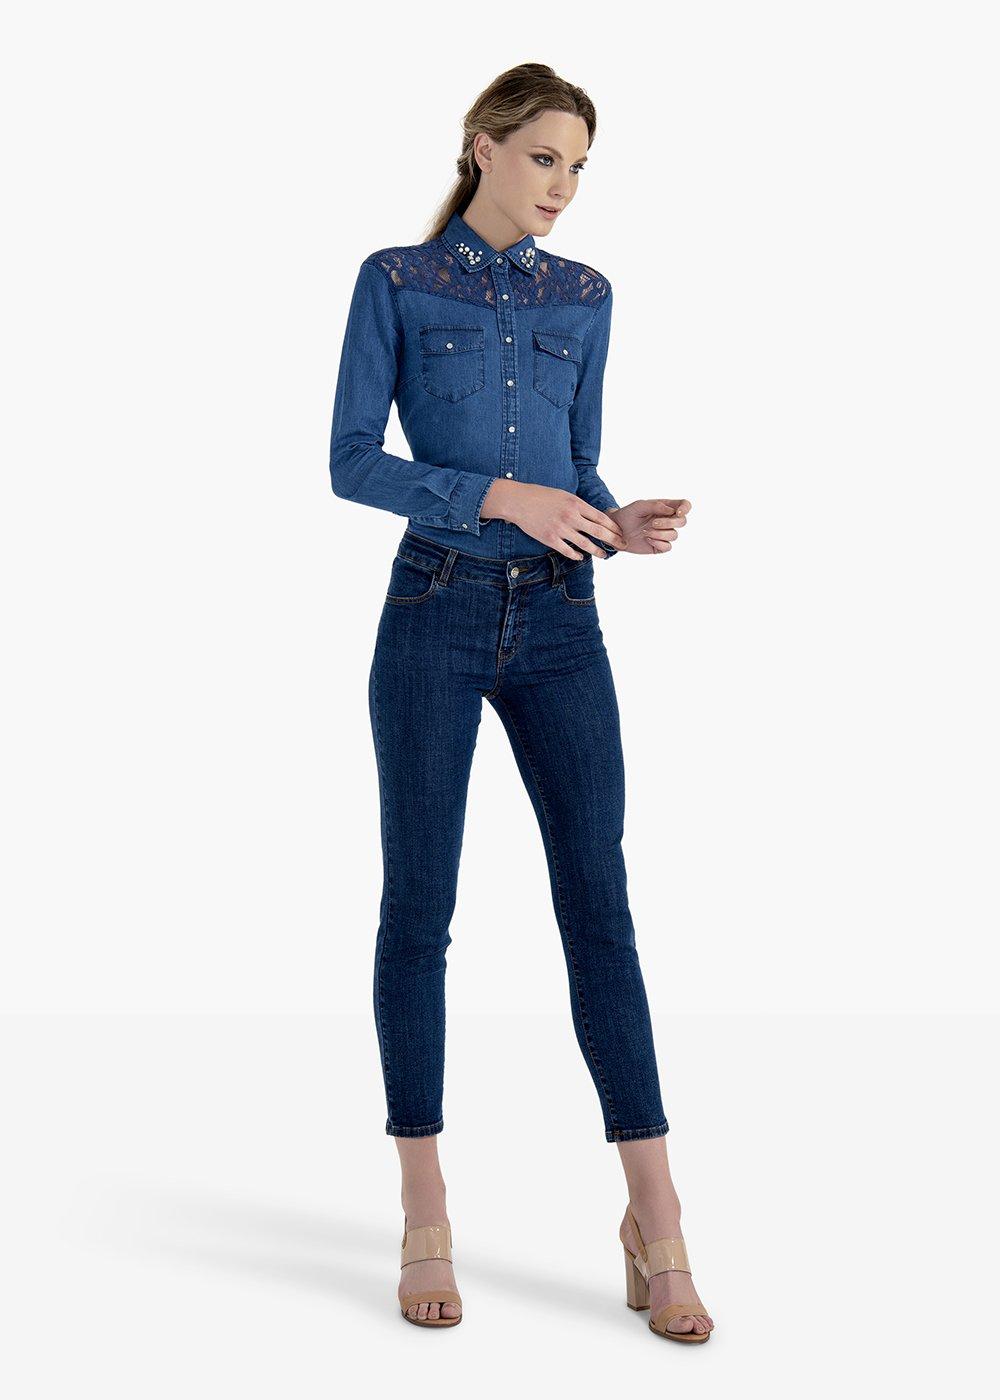 Kate denim trousers 5 pockets - Medium Blue - Woman